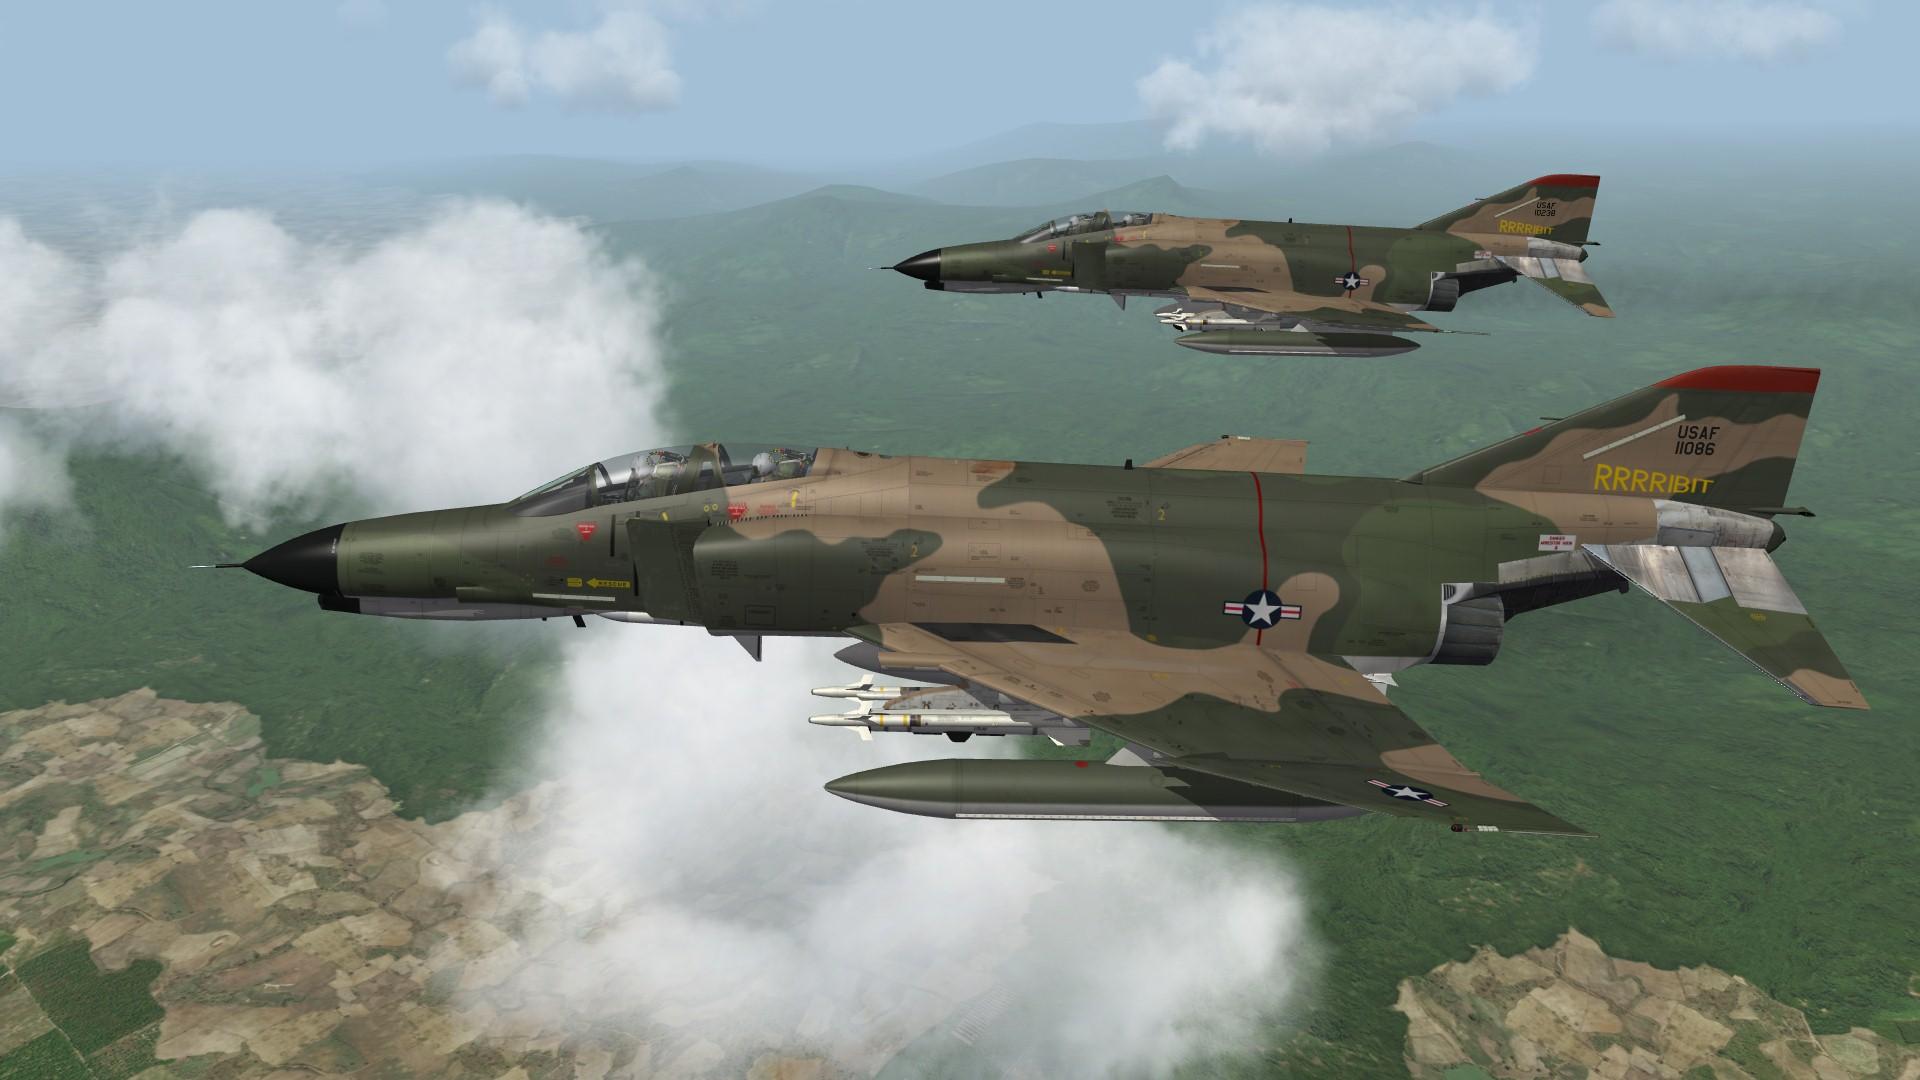 'Rivet Haste' F-4E USAF pack add-on